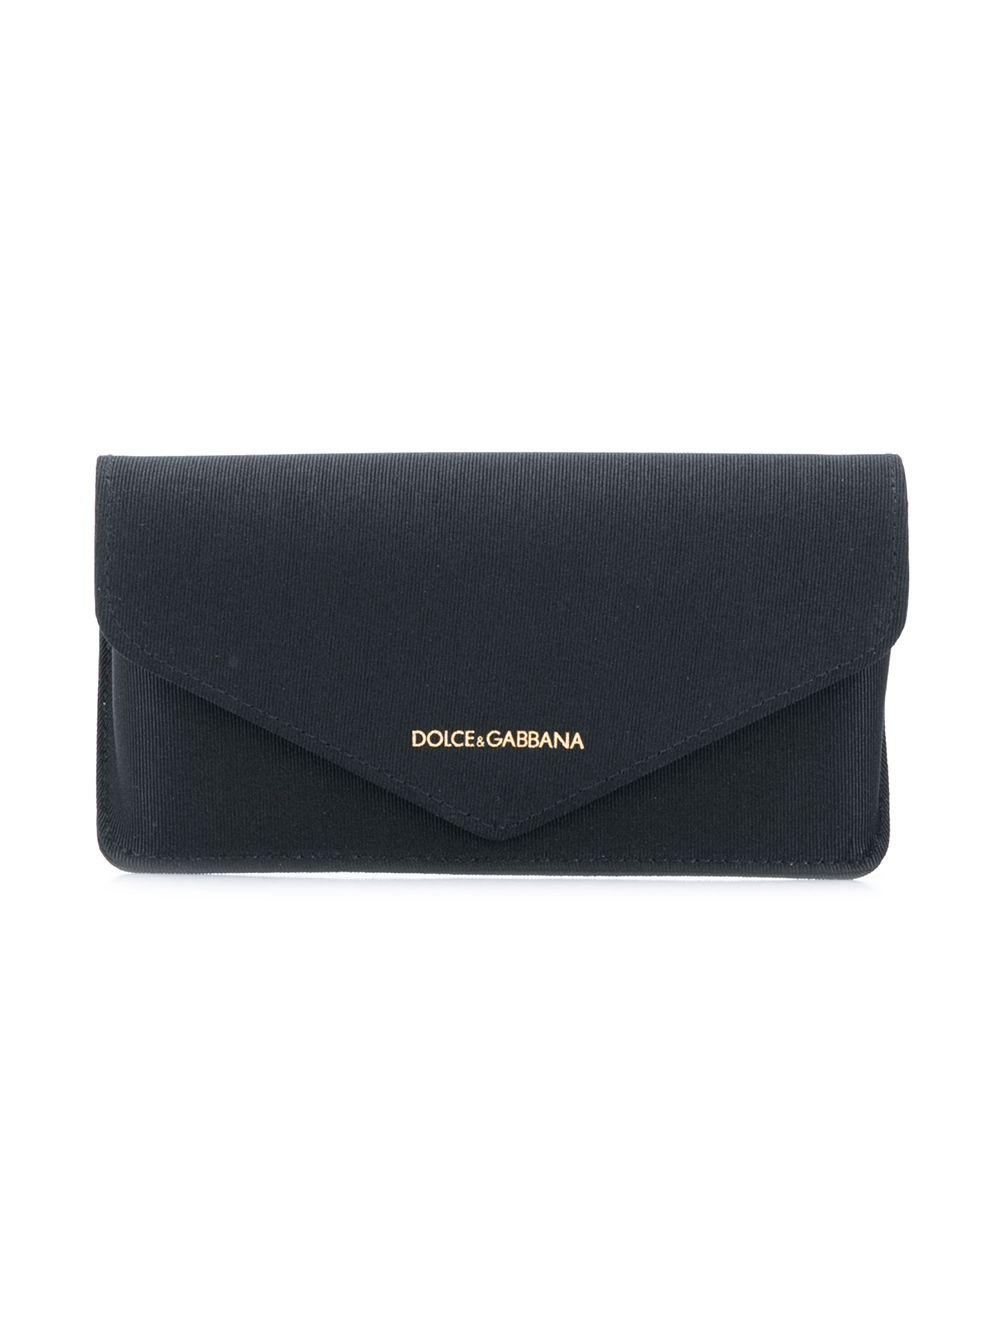 Dolce & Gabbana | солнцезащитные очки-авиаторы | Clouty